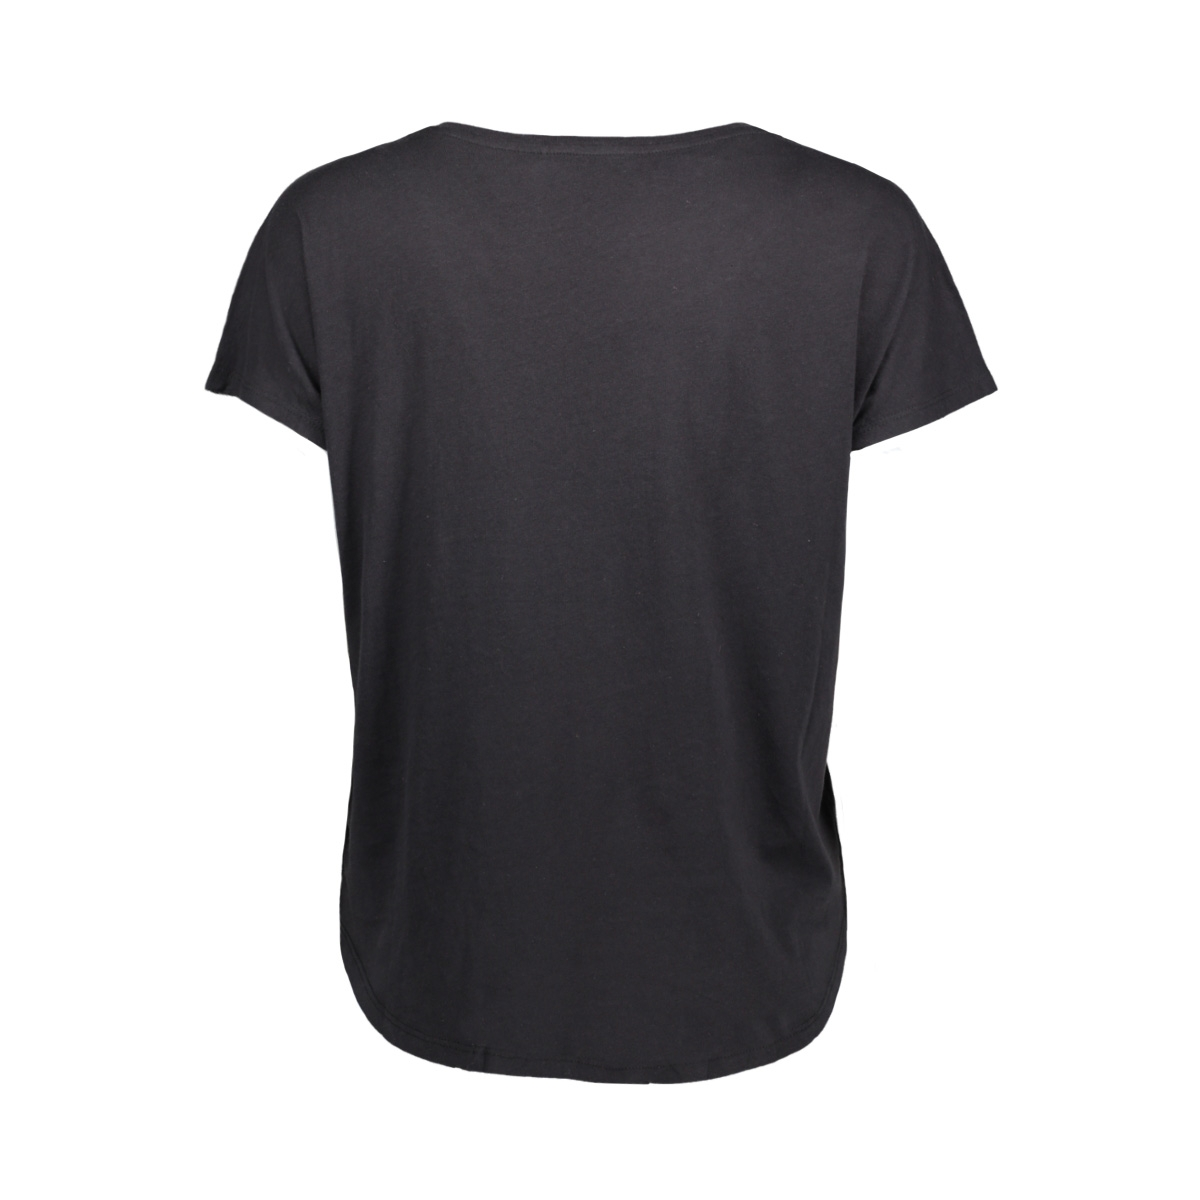 onpleslie loose ss tee prs 15139526 only play sport shirt black/tornado